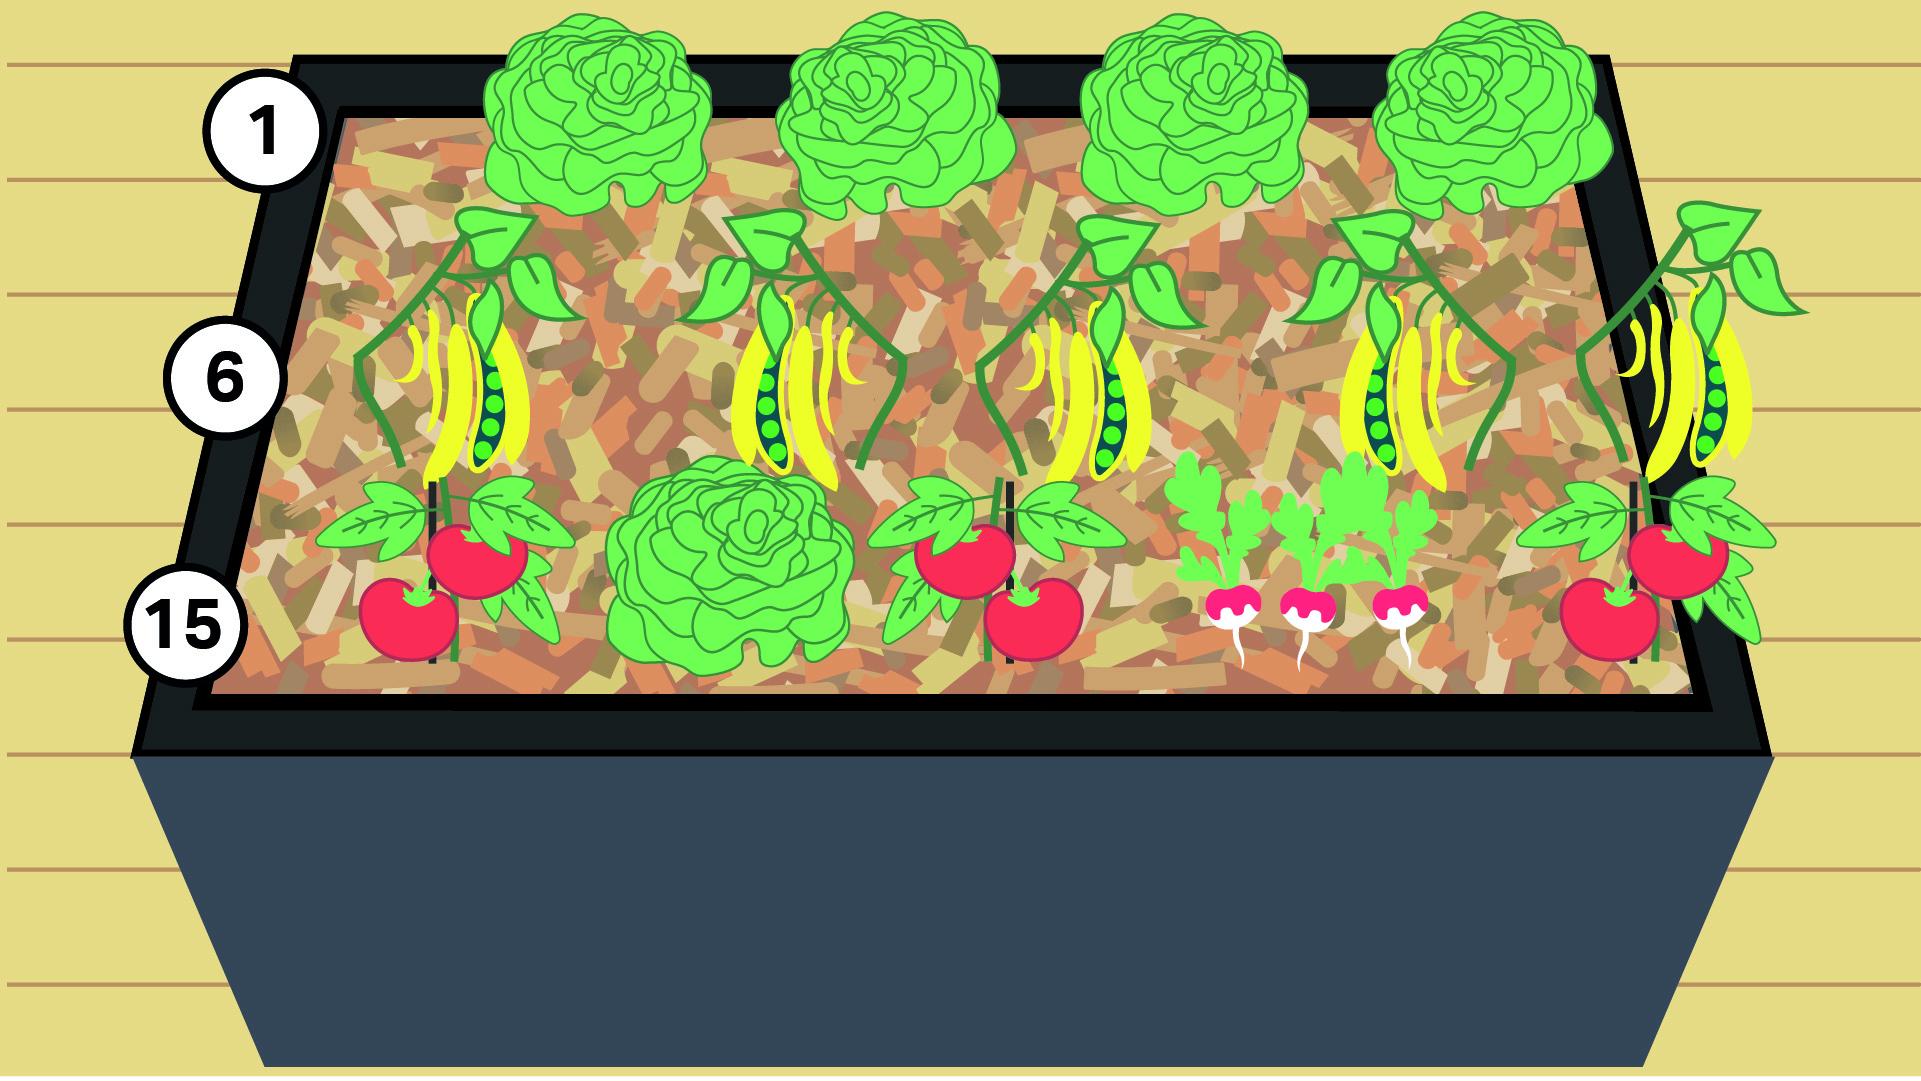 1 - Laitue 6 - Haricot 15 - Tomate